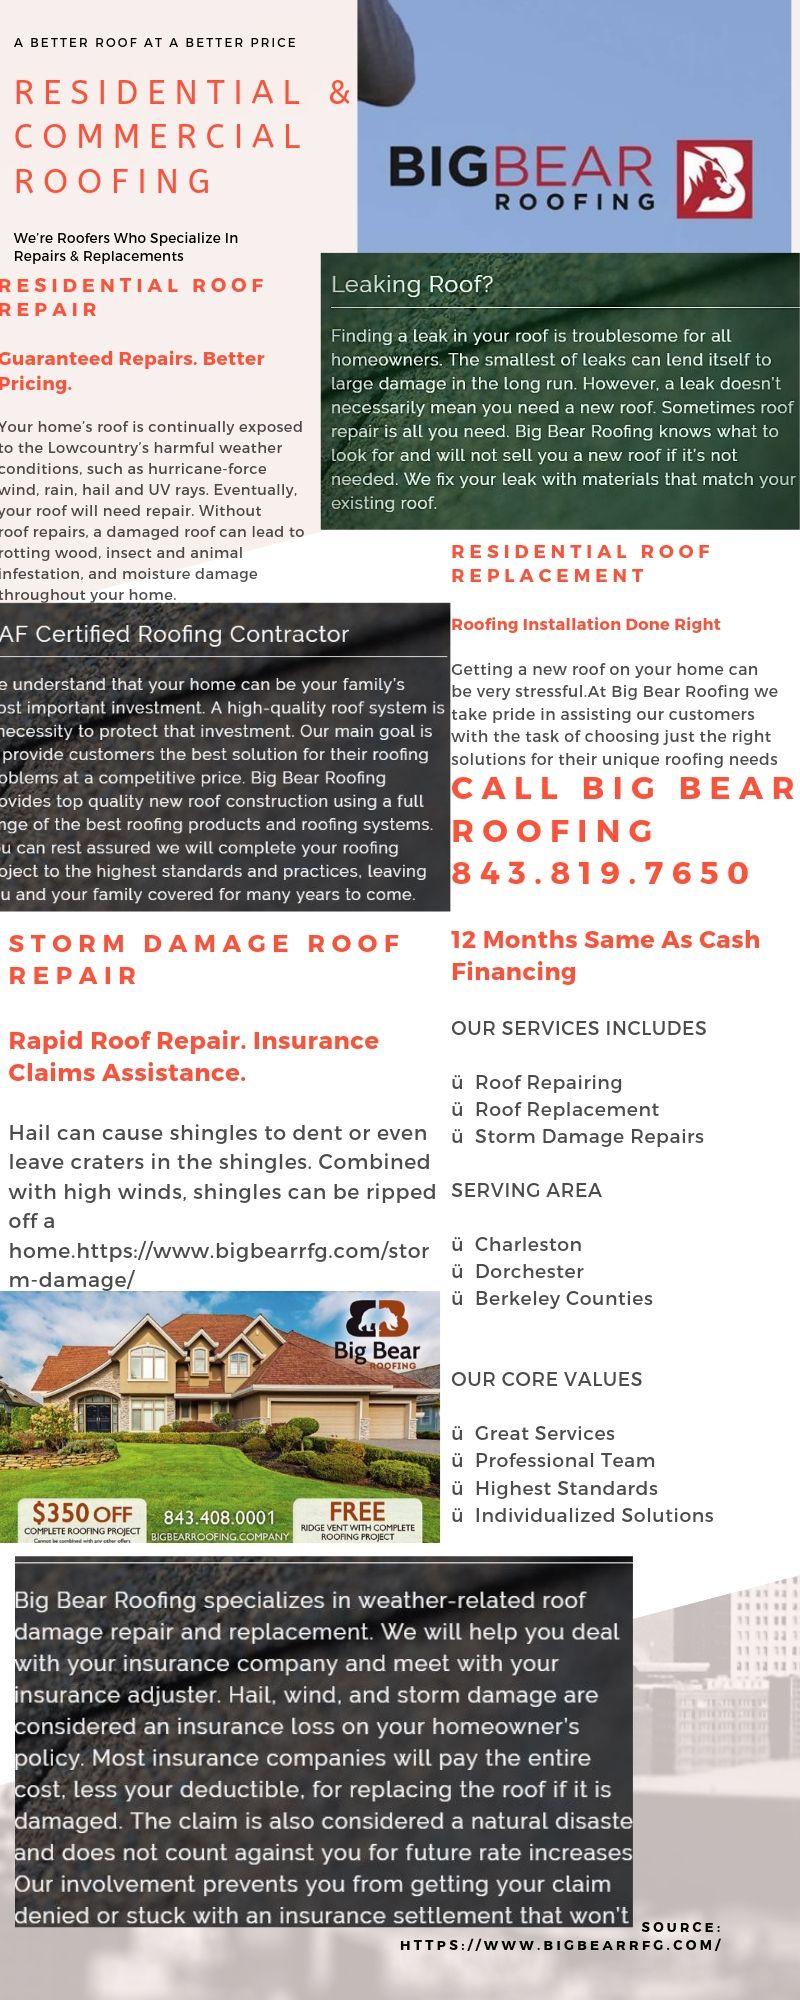 Pin By Big Bear On Roof Repairs Charleston Sc